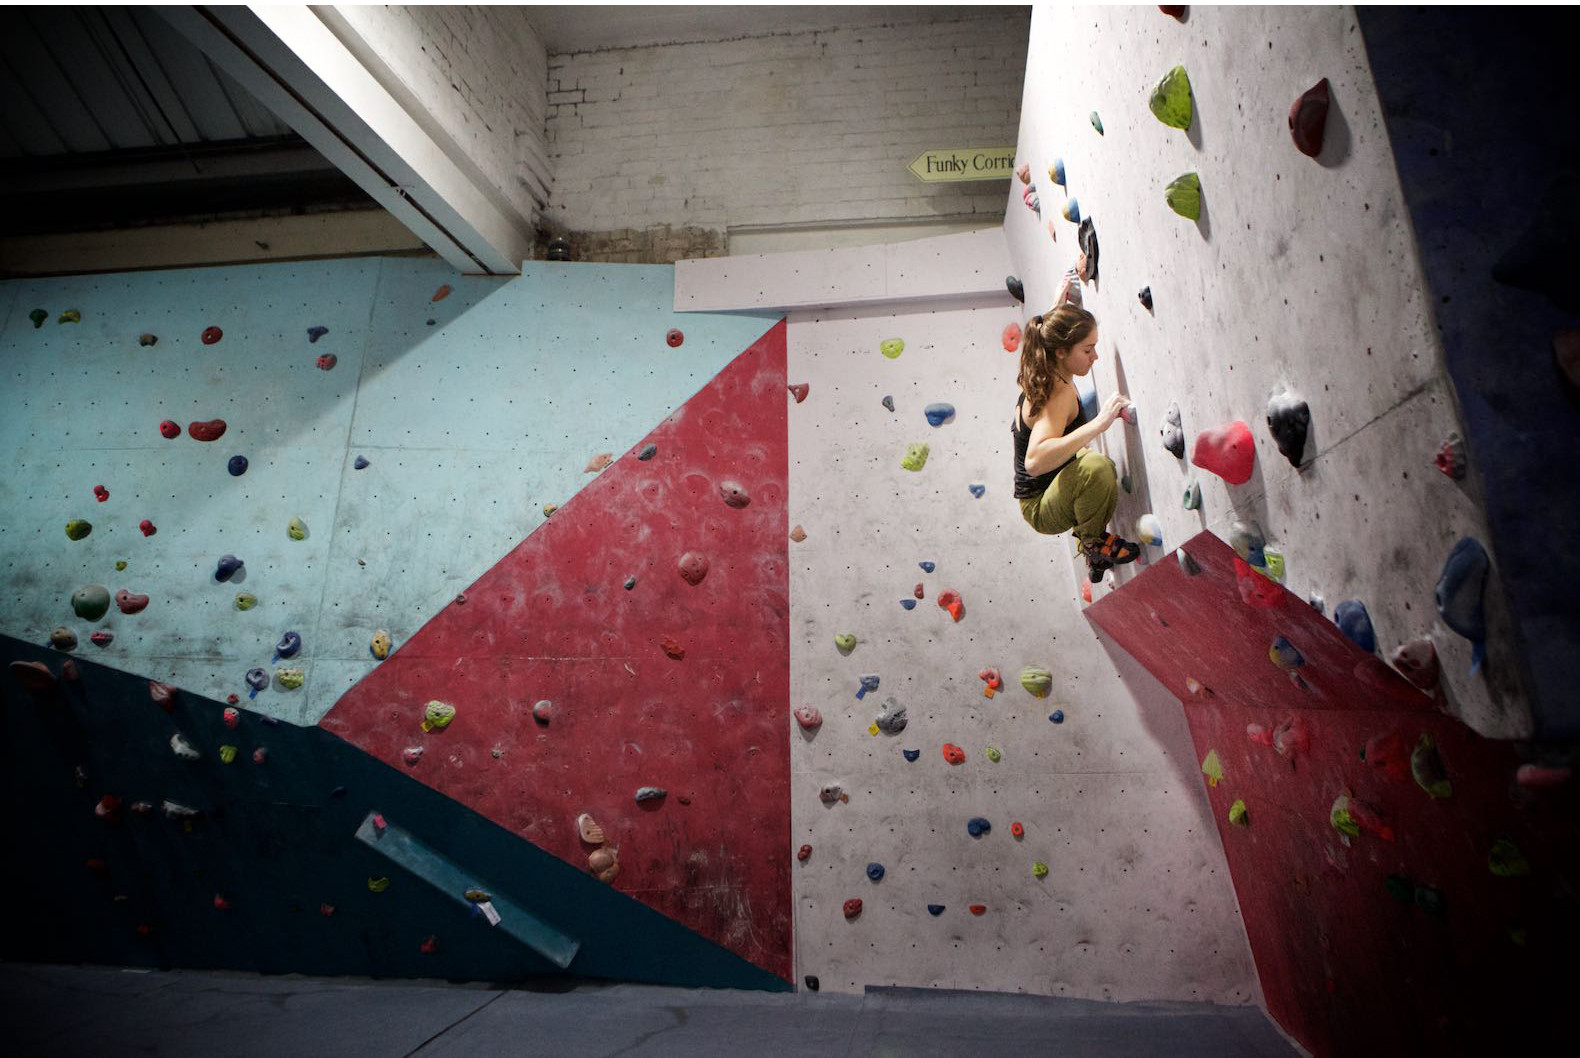 Teen climber above stepped wall